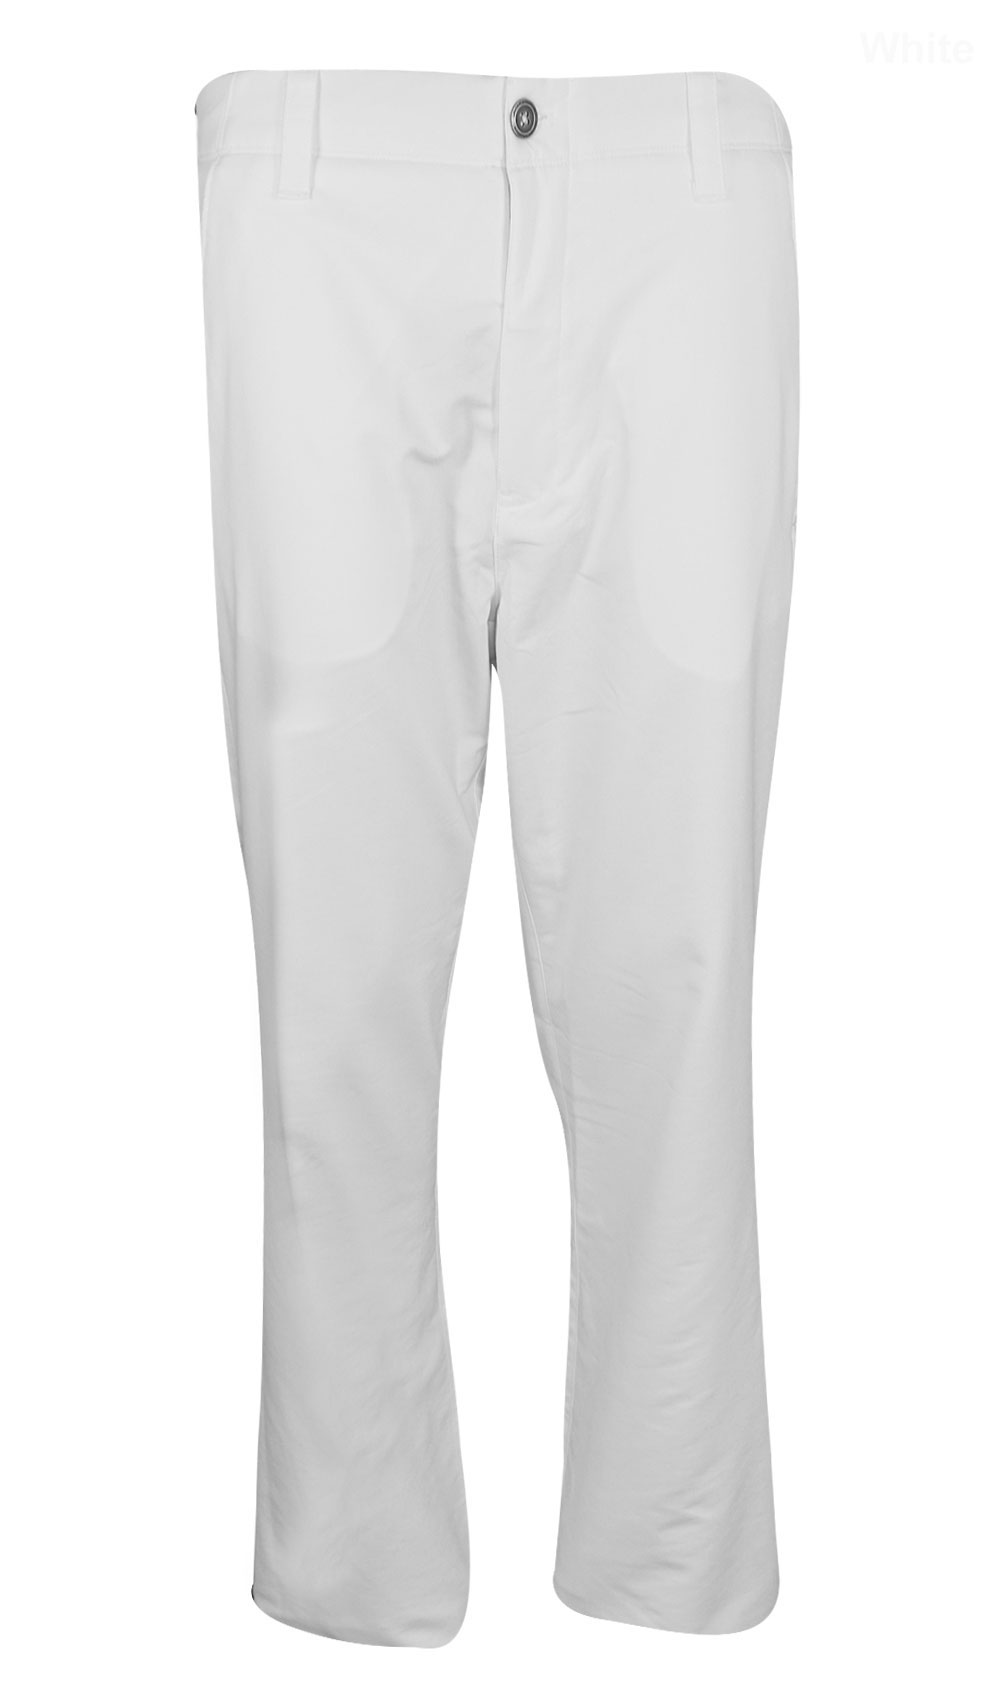 Under Armour Golf- Match Play Pants